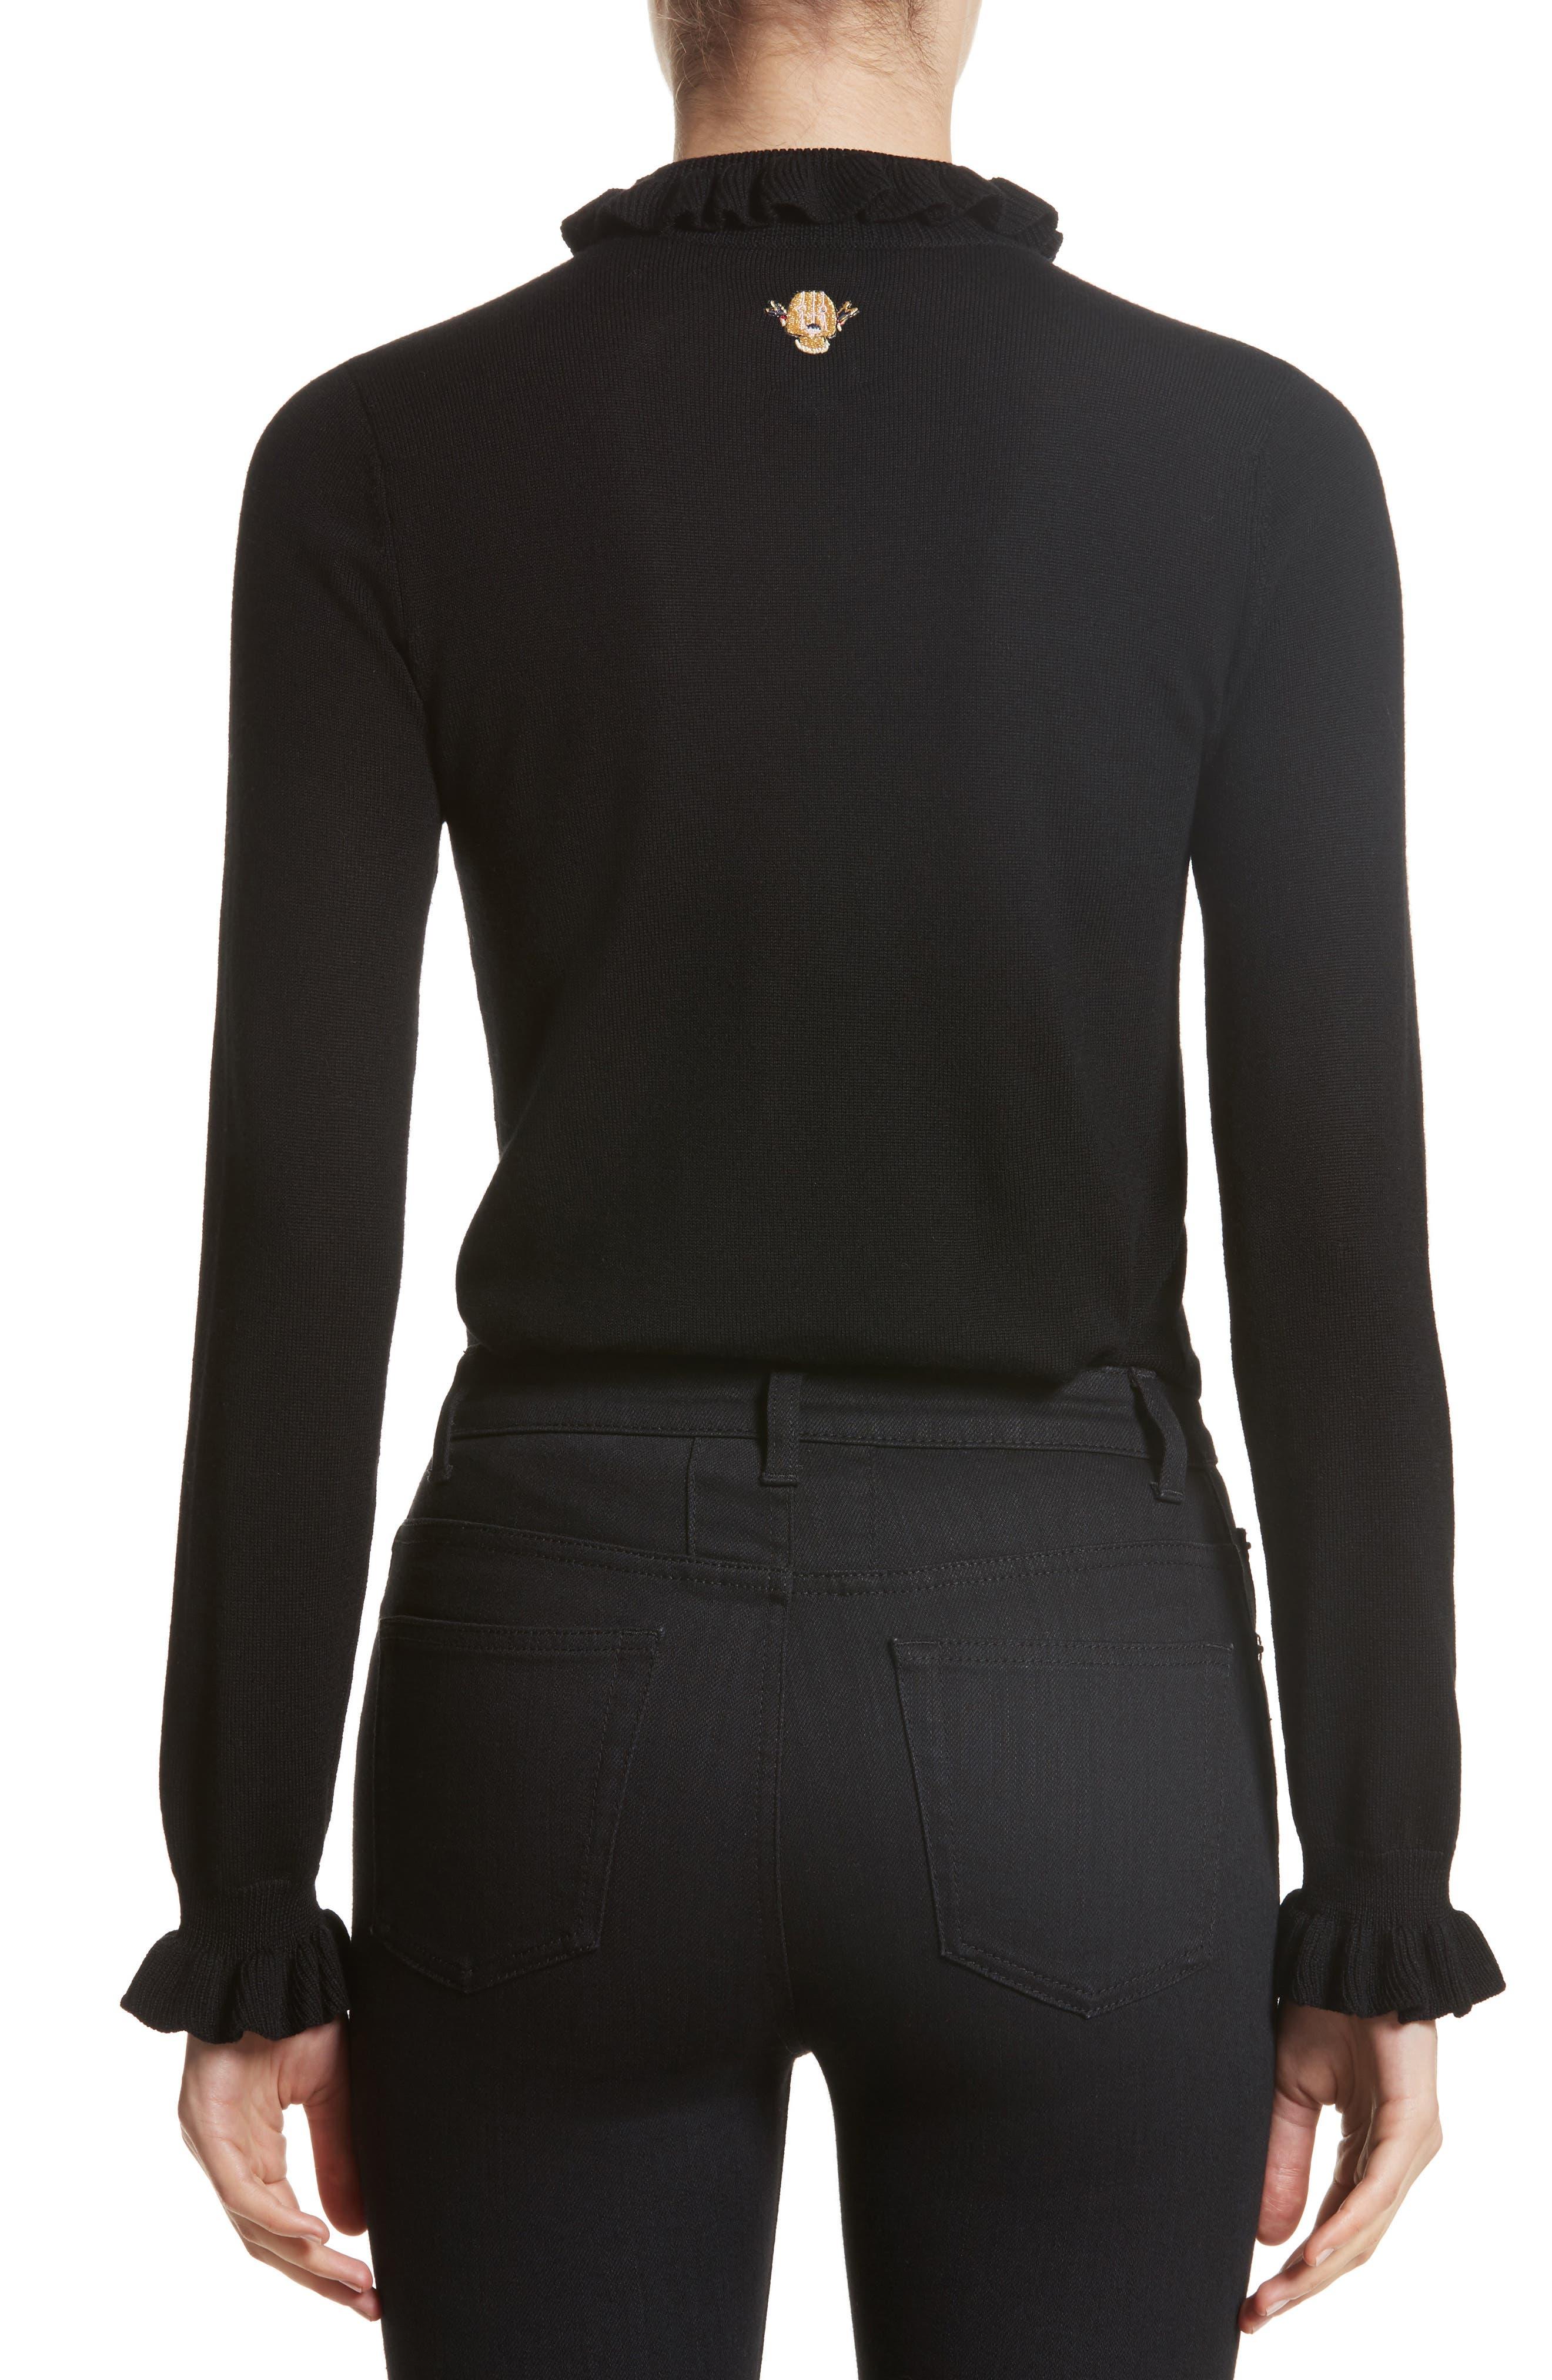 Robin Frill Wool Sweater,                             Alternate thumbnail 2, color,                             Black